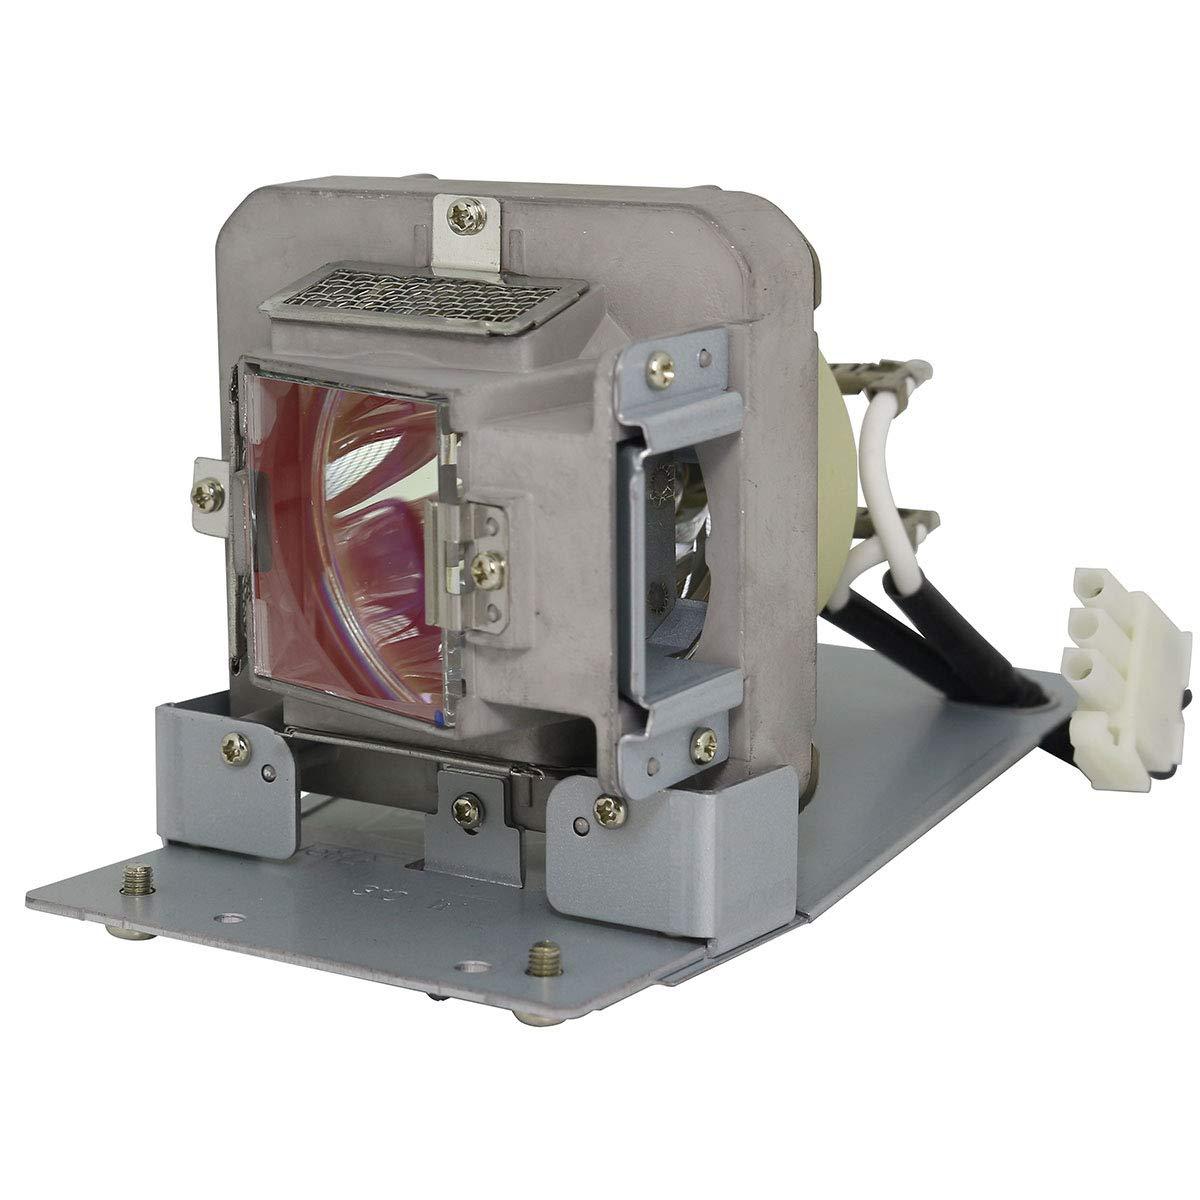 LYTIO プレミアムインフォーカス SP-LAMP-098 プロジェクターランプ ハウジング付き SPランプ 098 (オリジナルフィリップス電球内蔵)   B07JWKHMT2